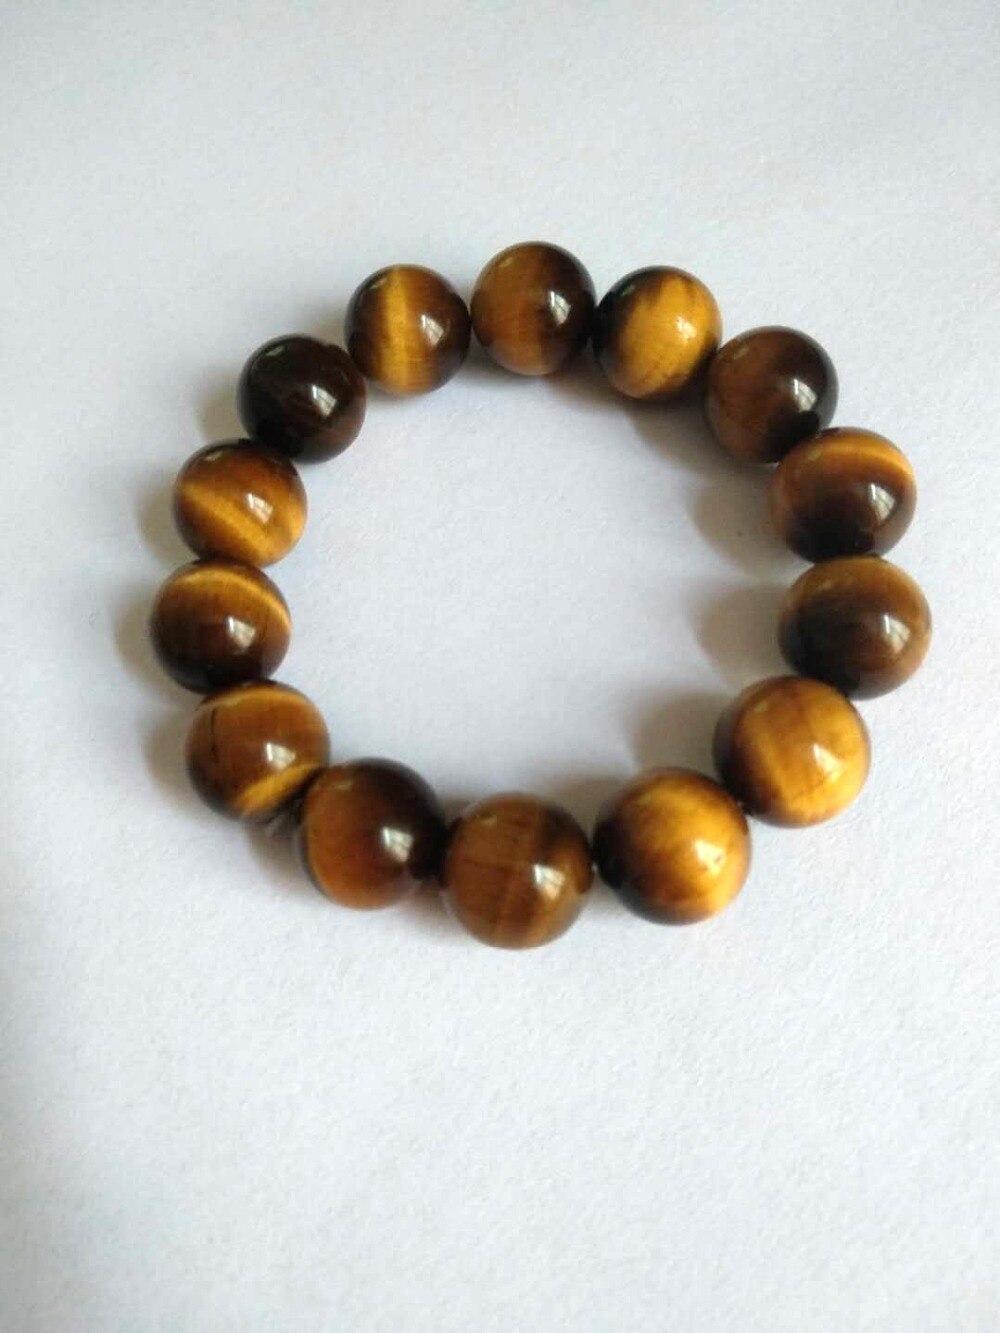 10mm Natural Yellow Tiger Eye Stone Bead Bracelet